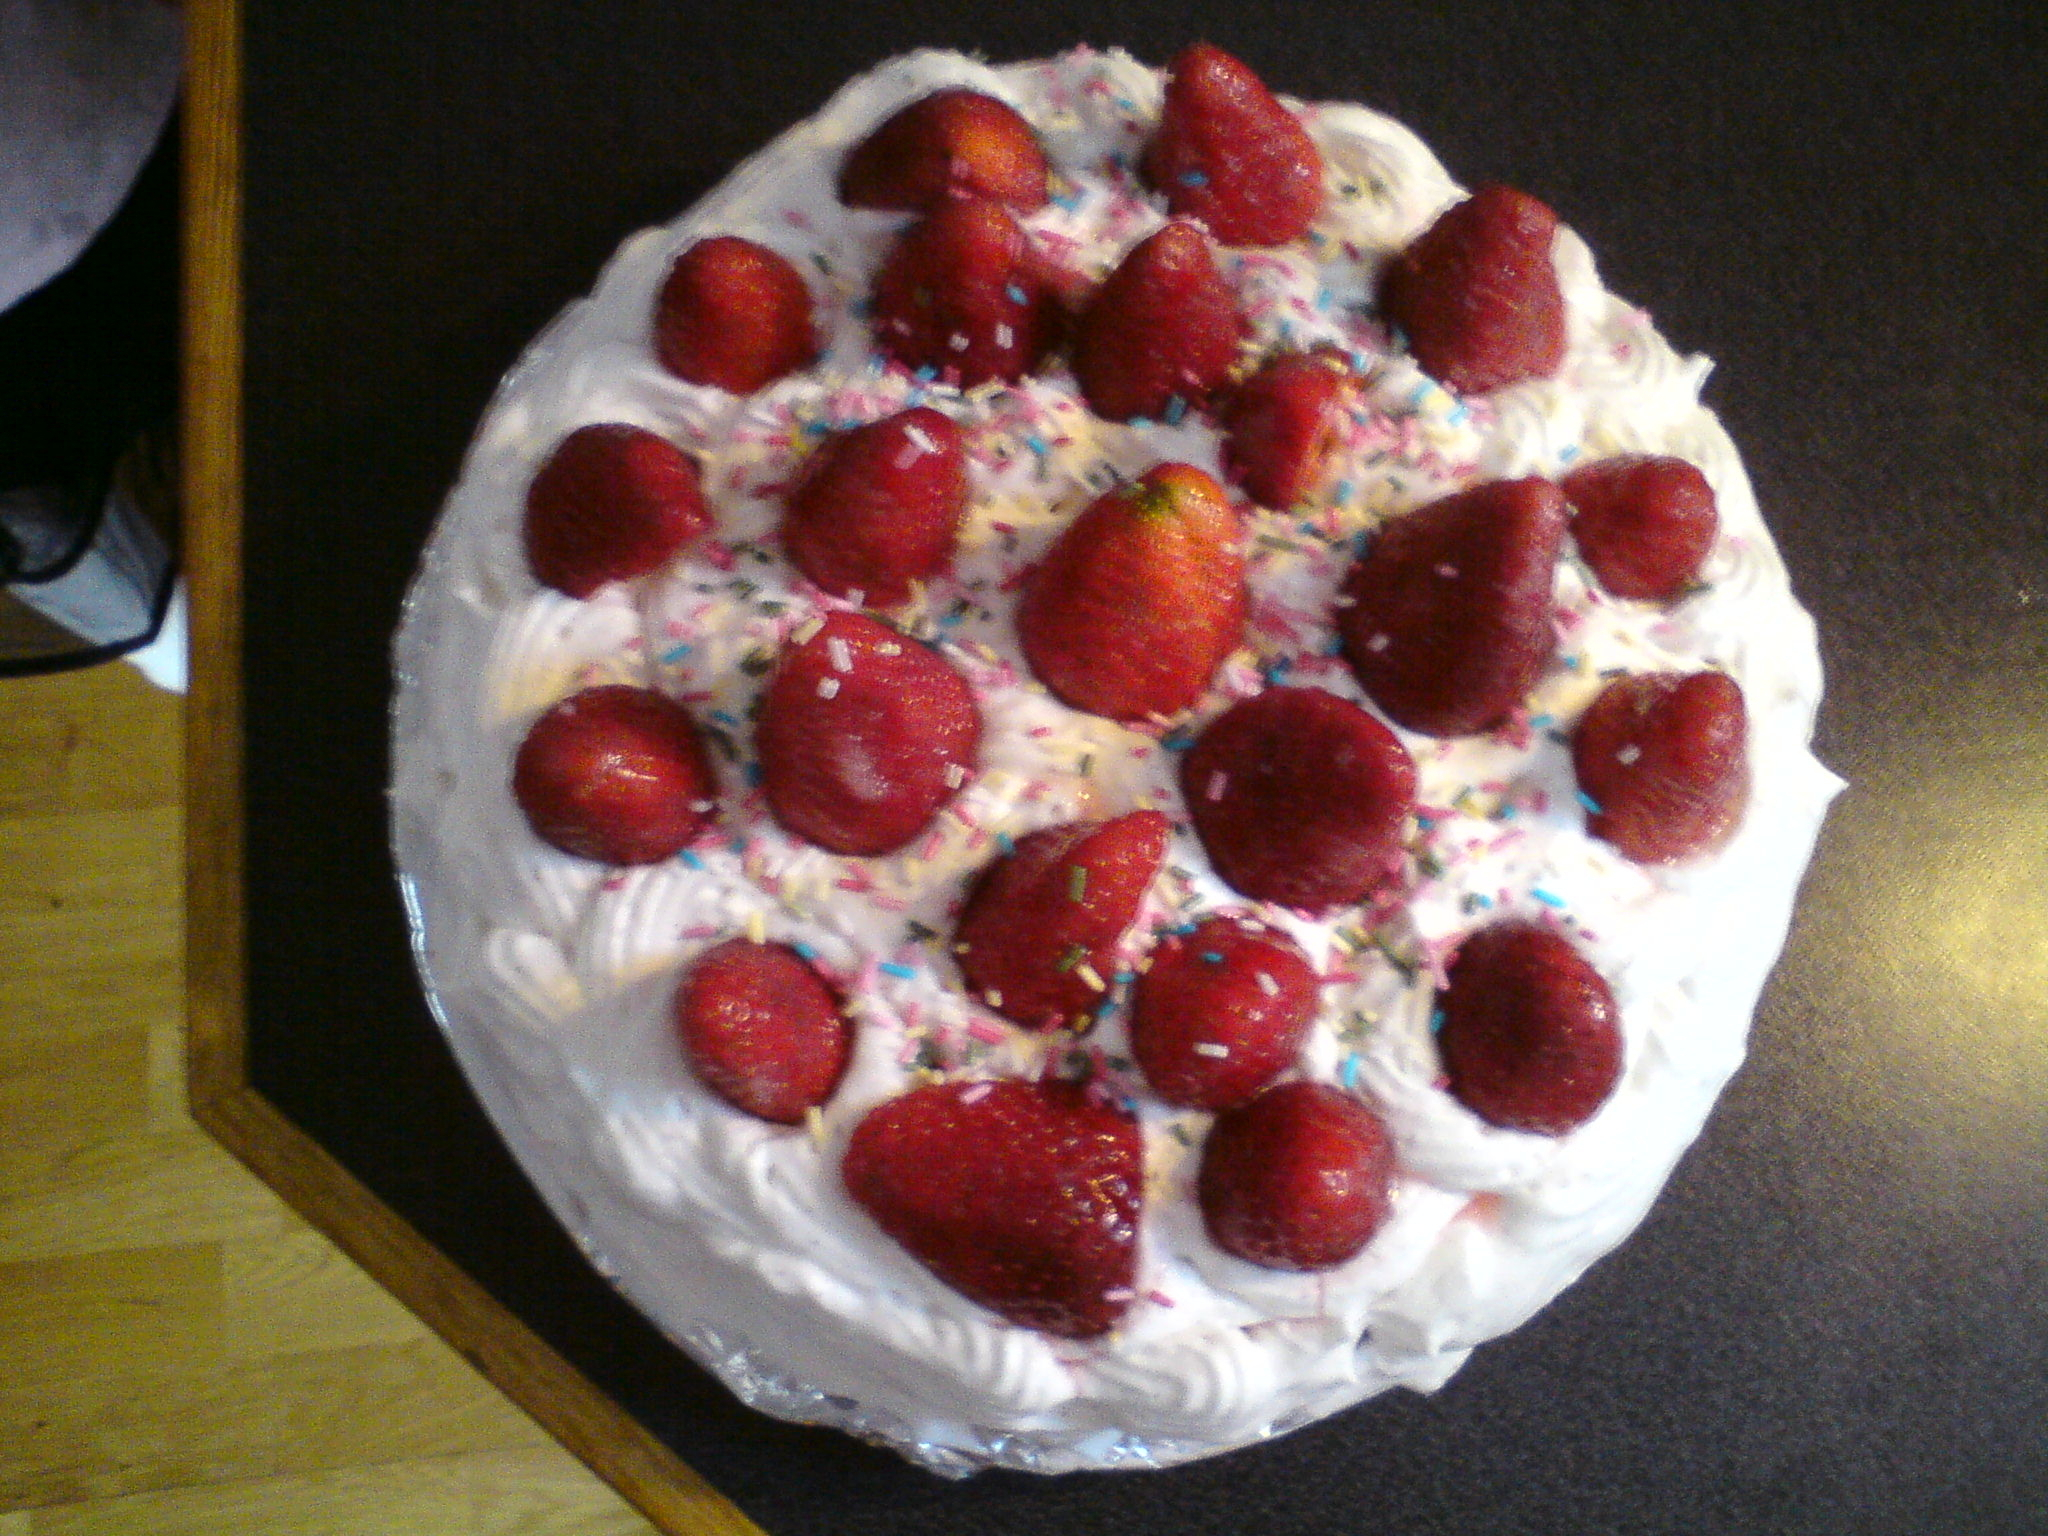 mjölkfri jordgubbstårta